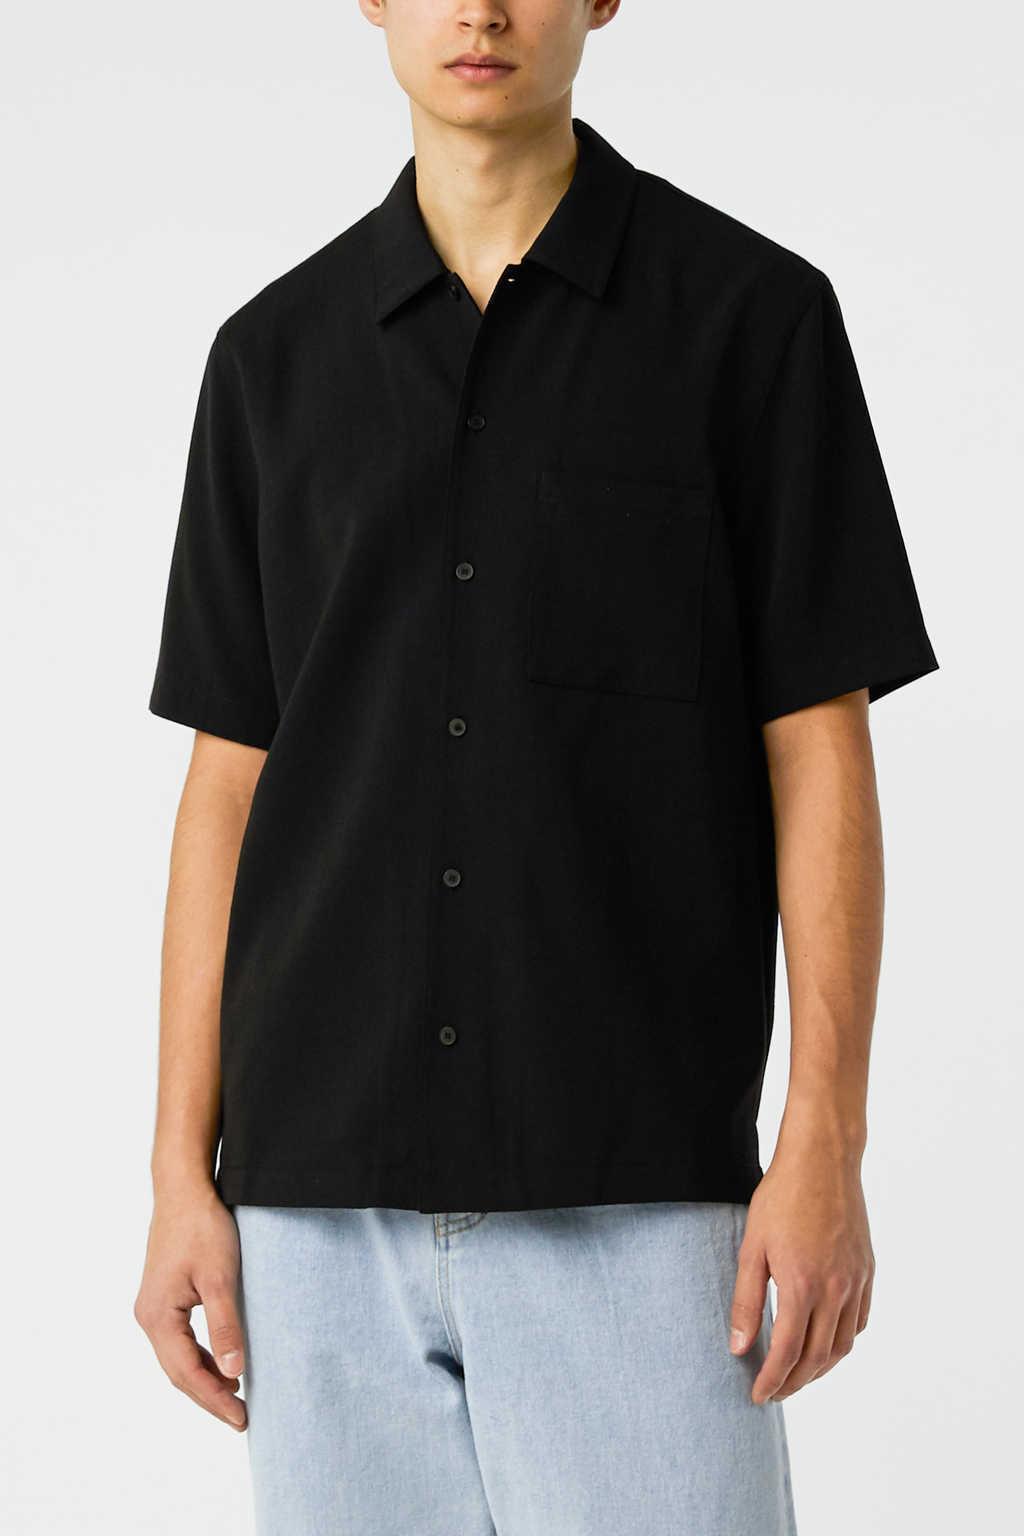 Shirt 3139 Black 10